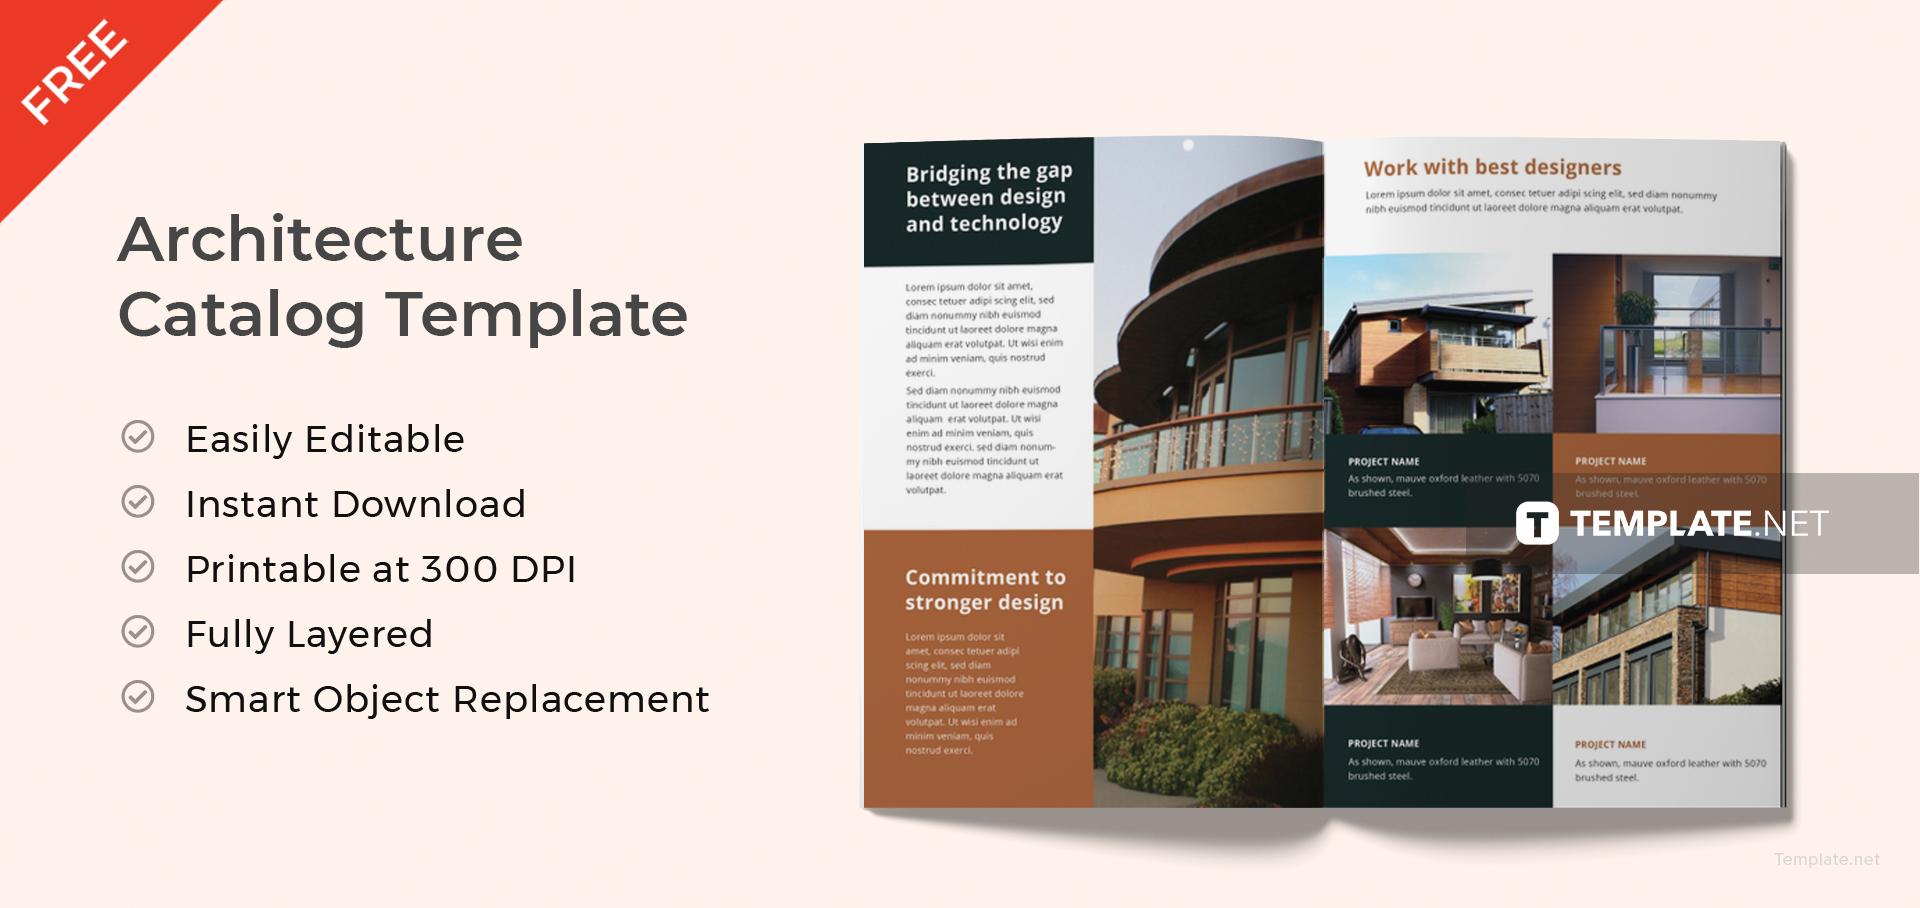 Architecture Catalog Template